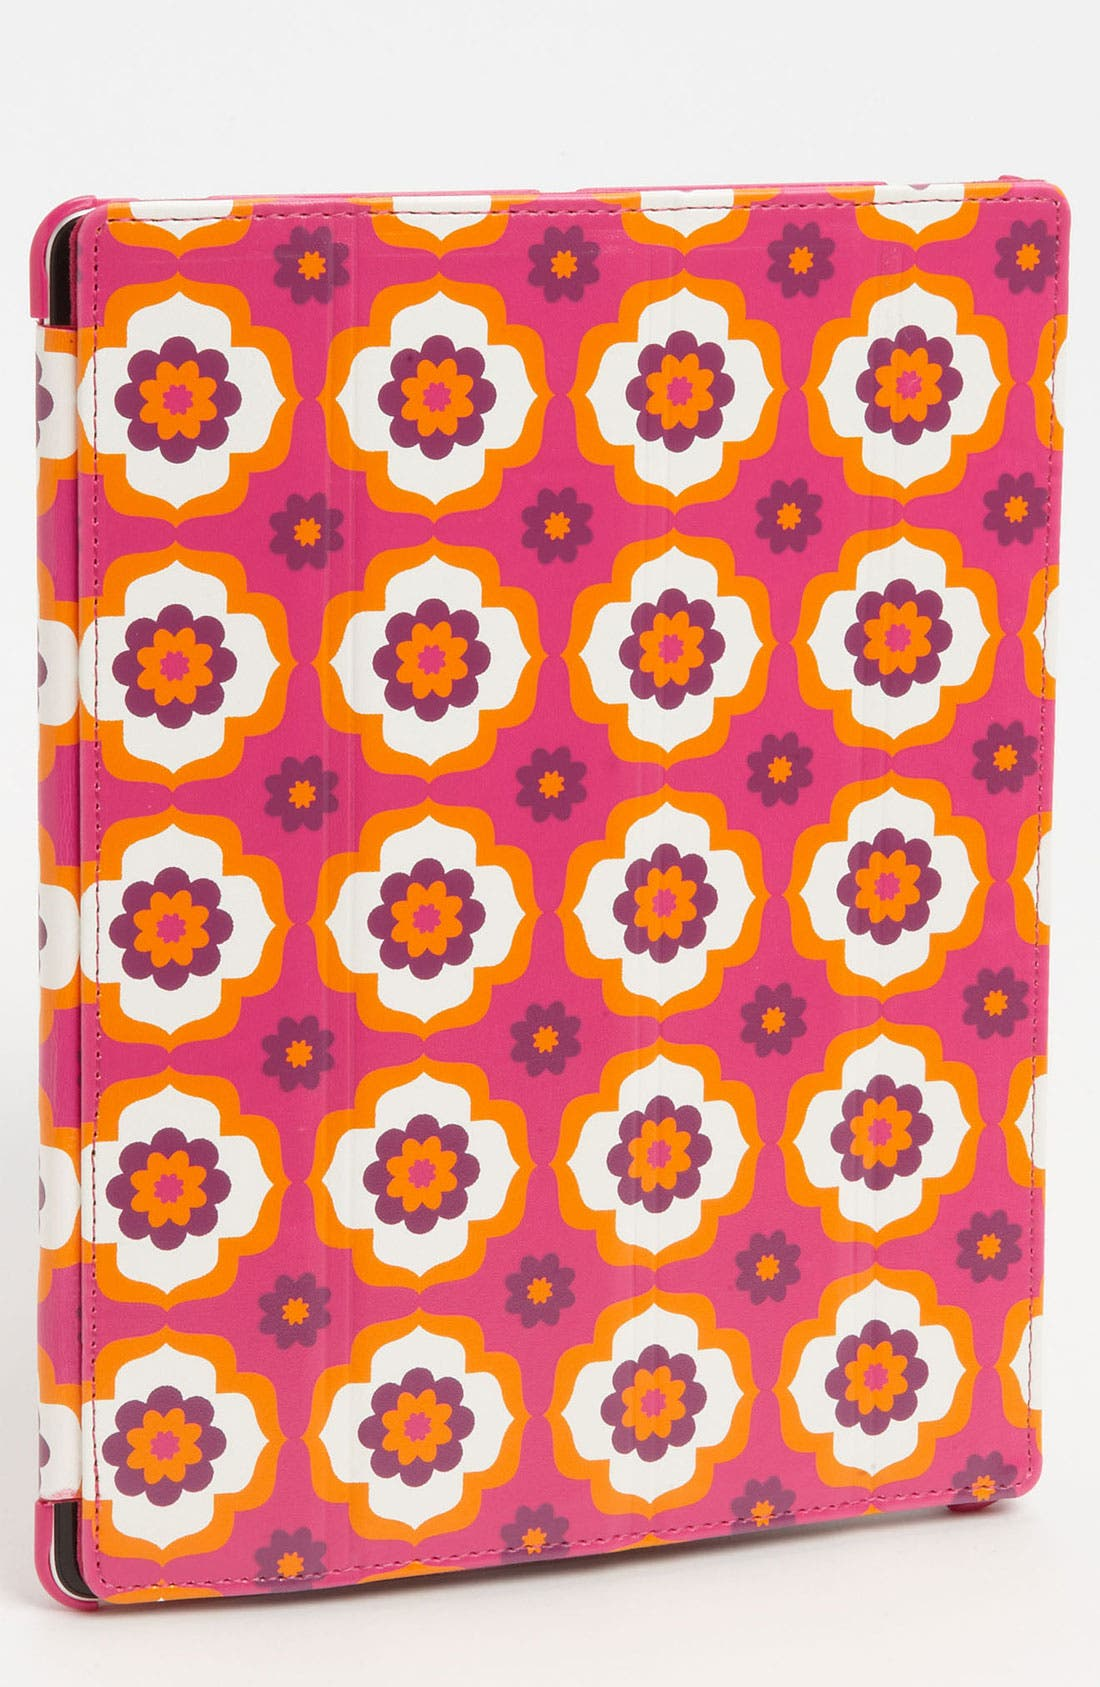 Alternate Image 1 Selected - Jonathan Adler 'Retro Floral' iPad 2 Case